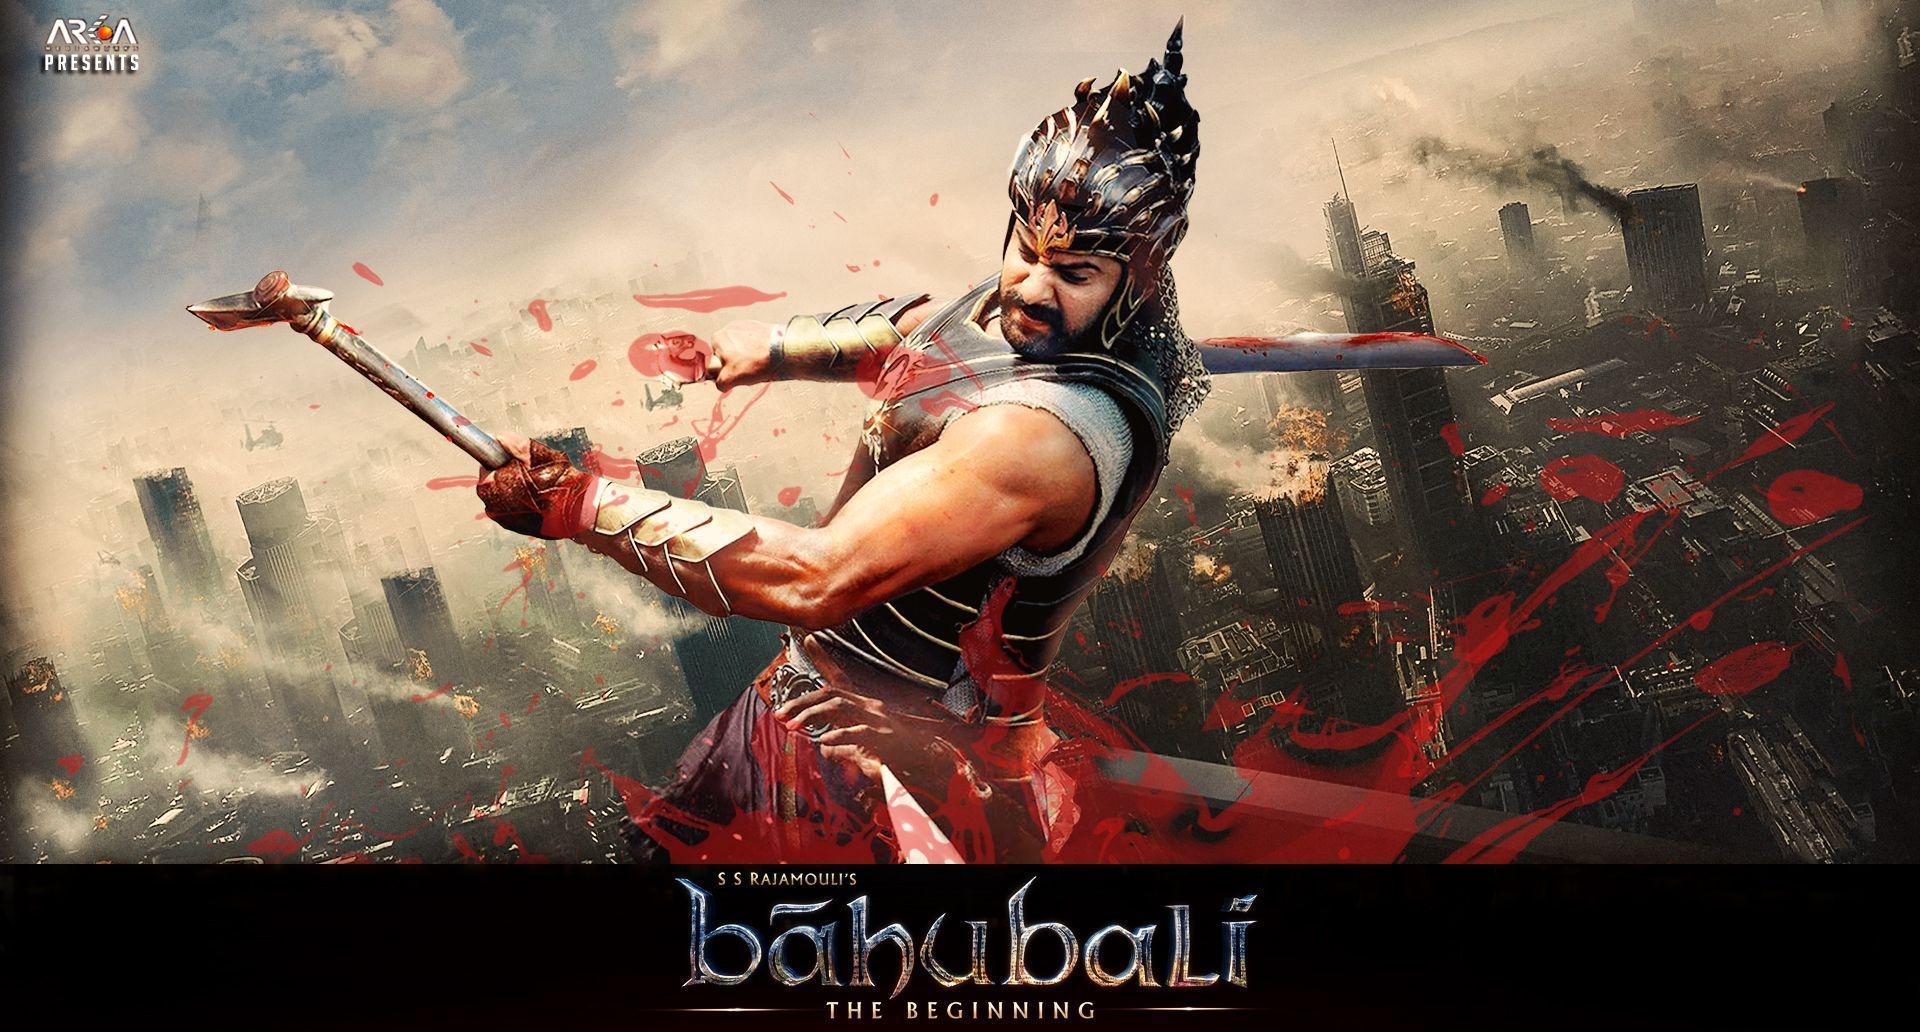 Baahubali-The Beginning Wallpapers - Sumo Creations